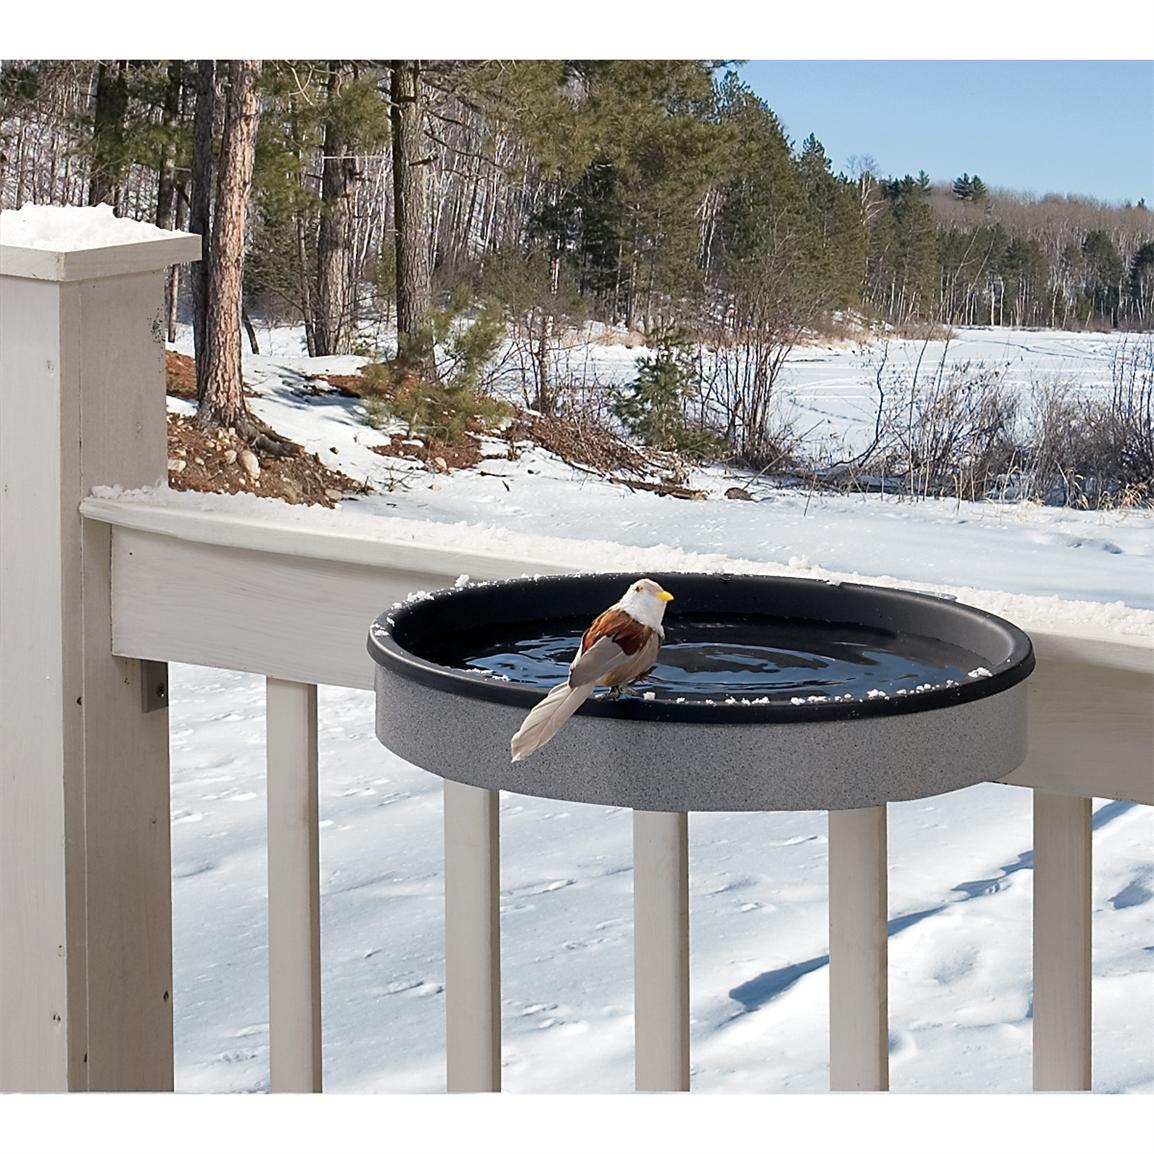 Heated Deck-mount Metal Bird Bath